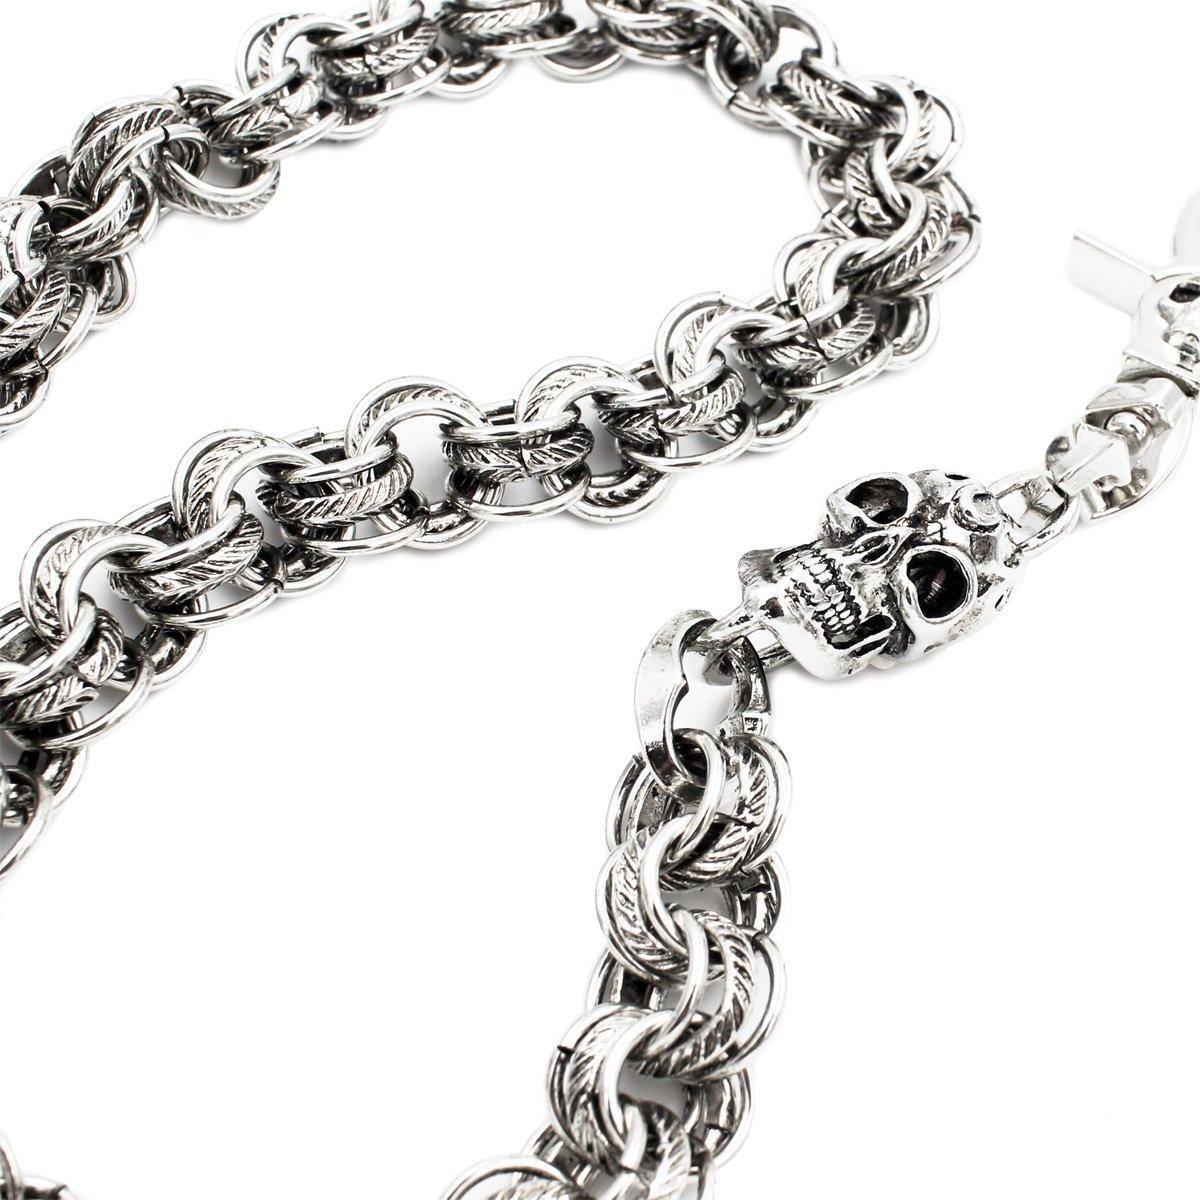 305e270e2b35 Amazon.com: Uniqsum Fire Skull charm Vintage Ring links wallet chain ...